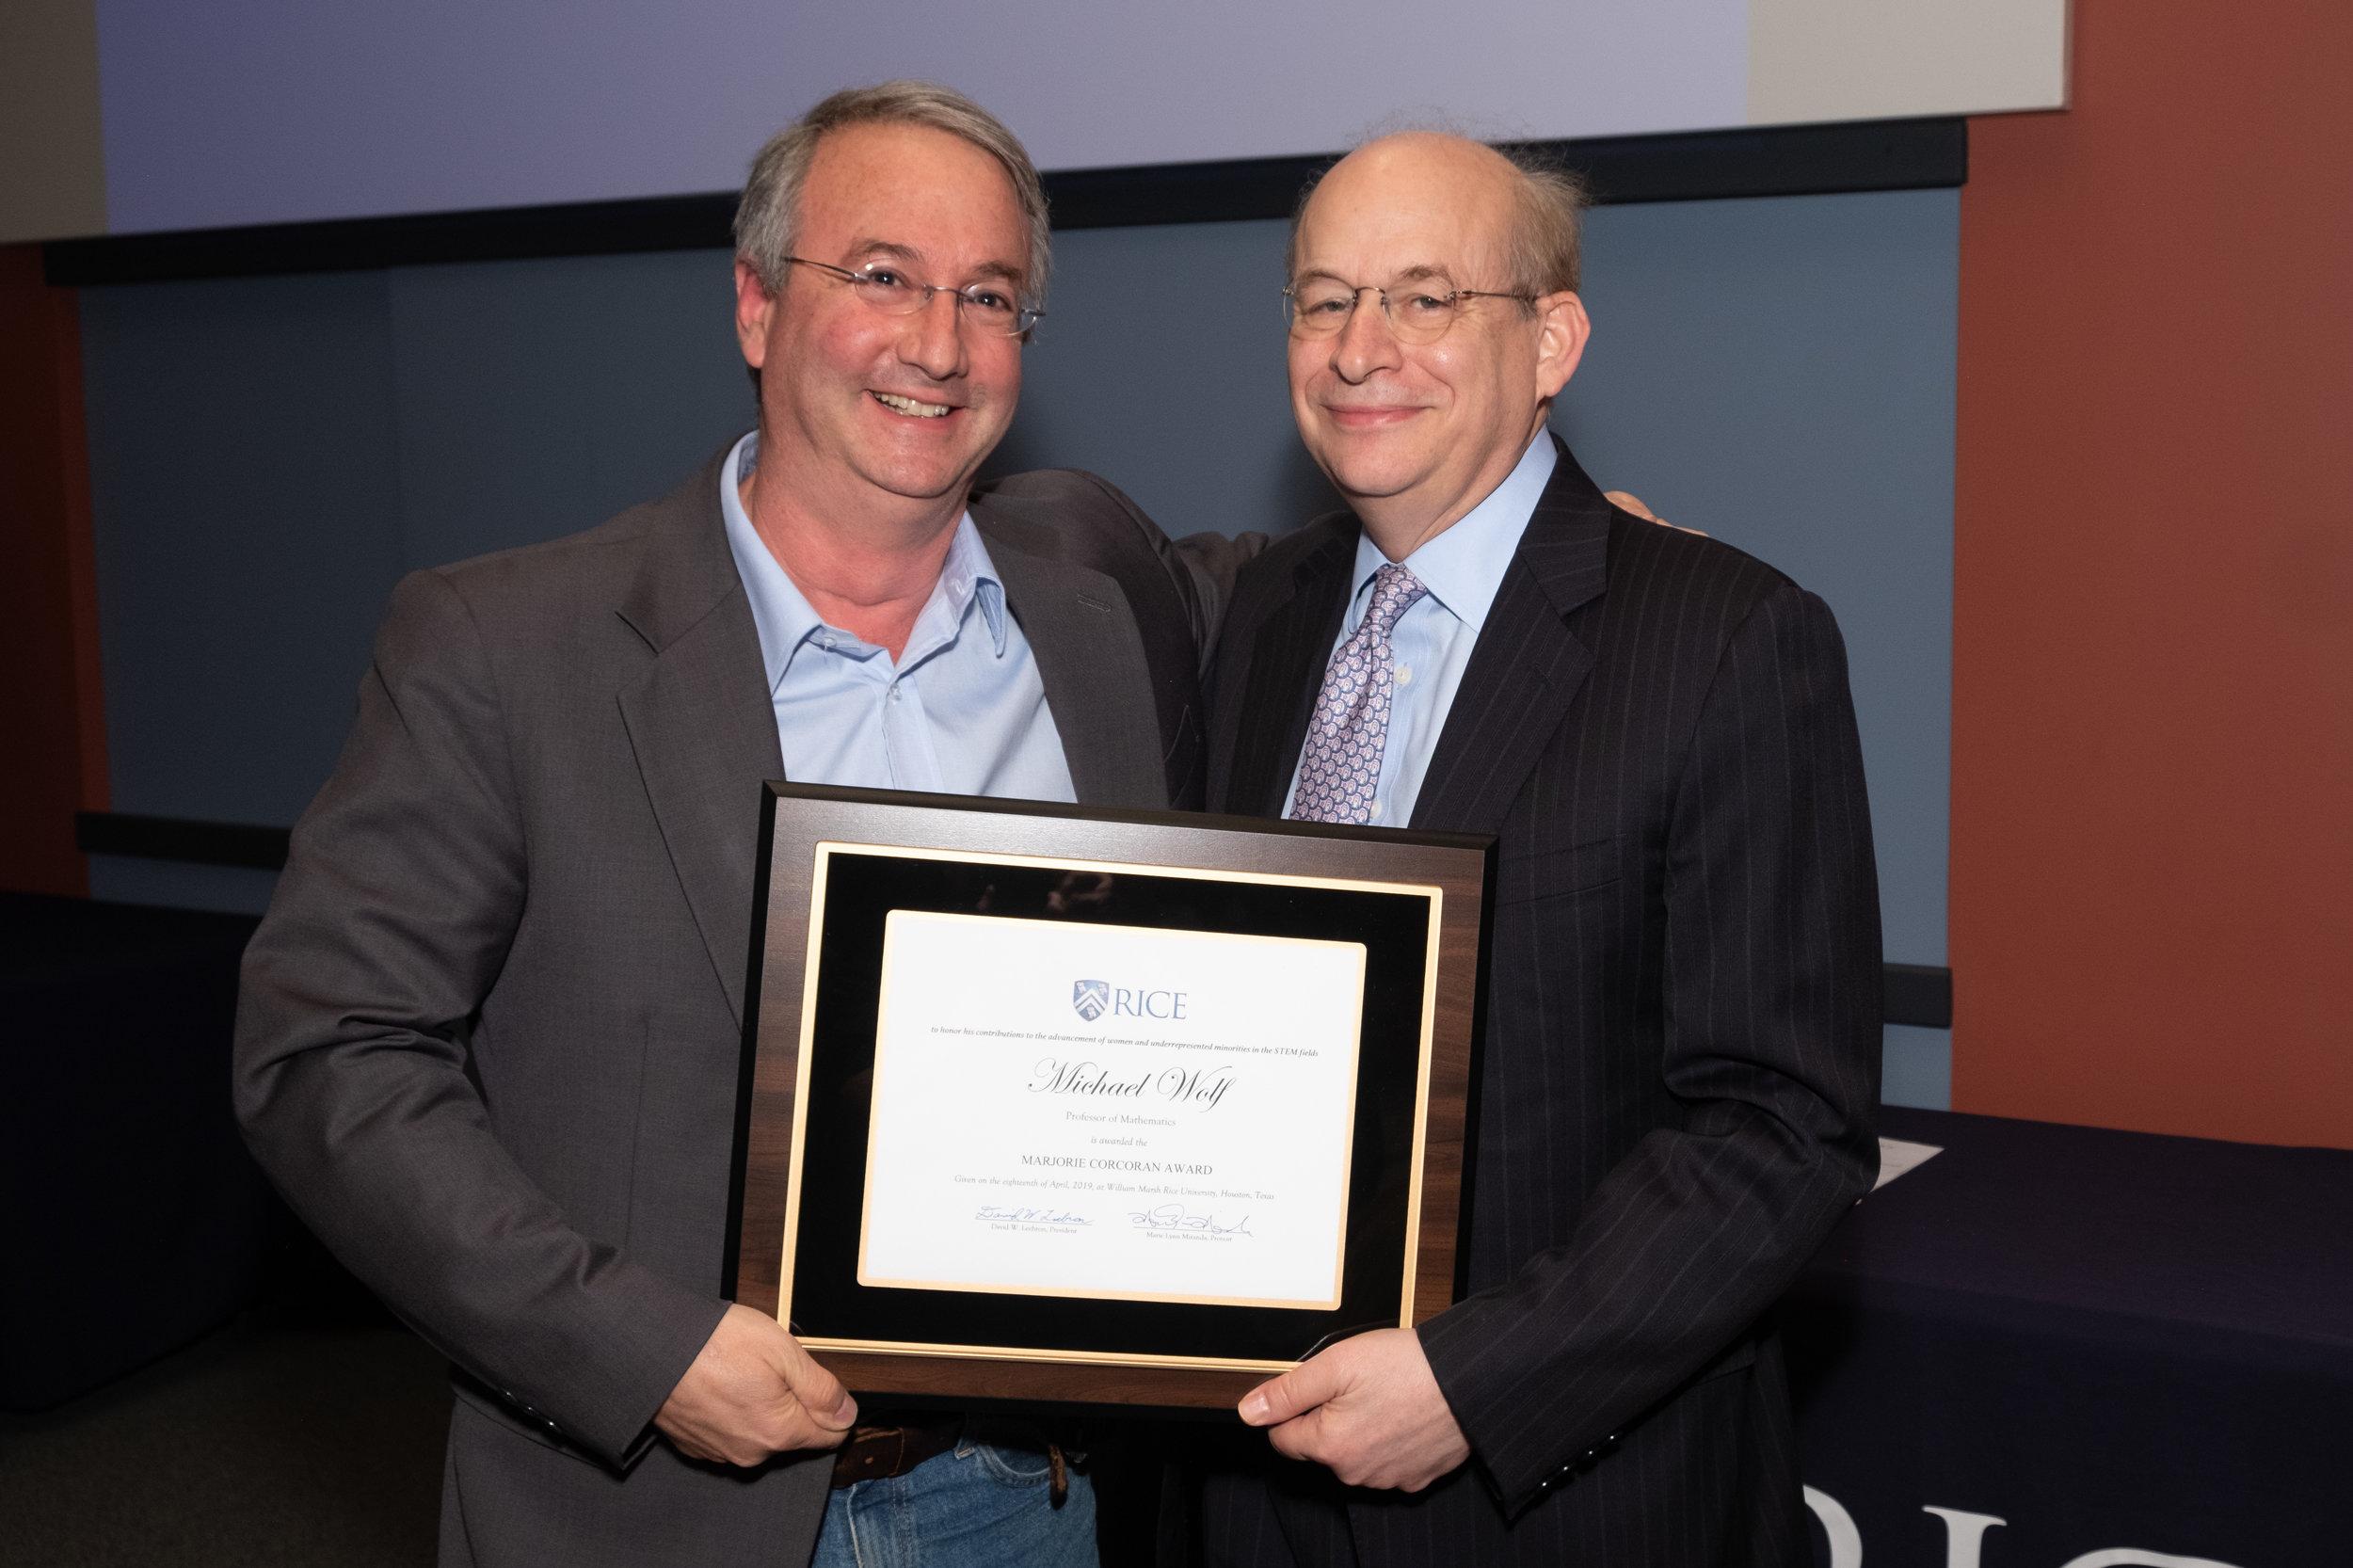 President Leebron & Michael Wolf, Marjorie Corcoran Award